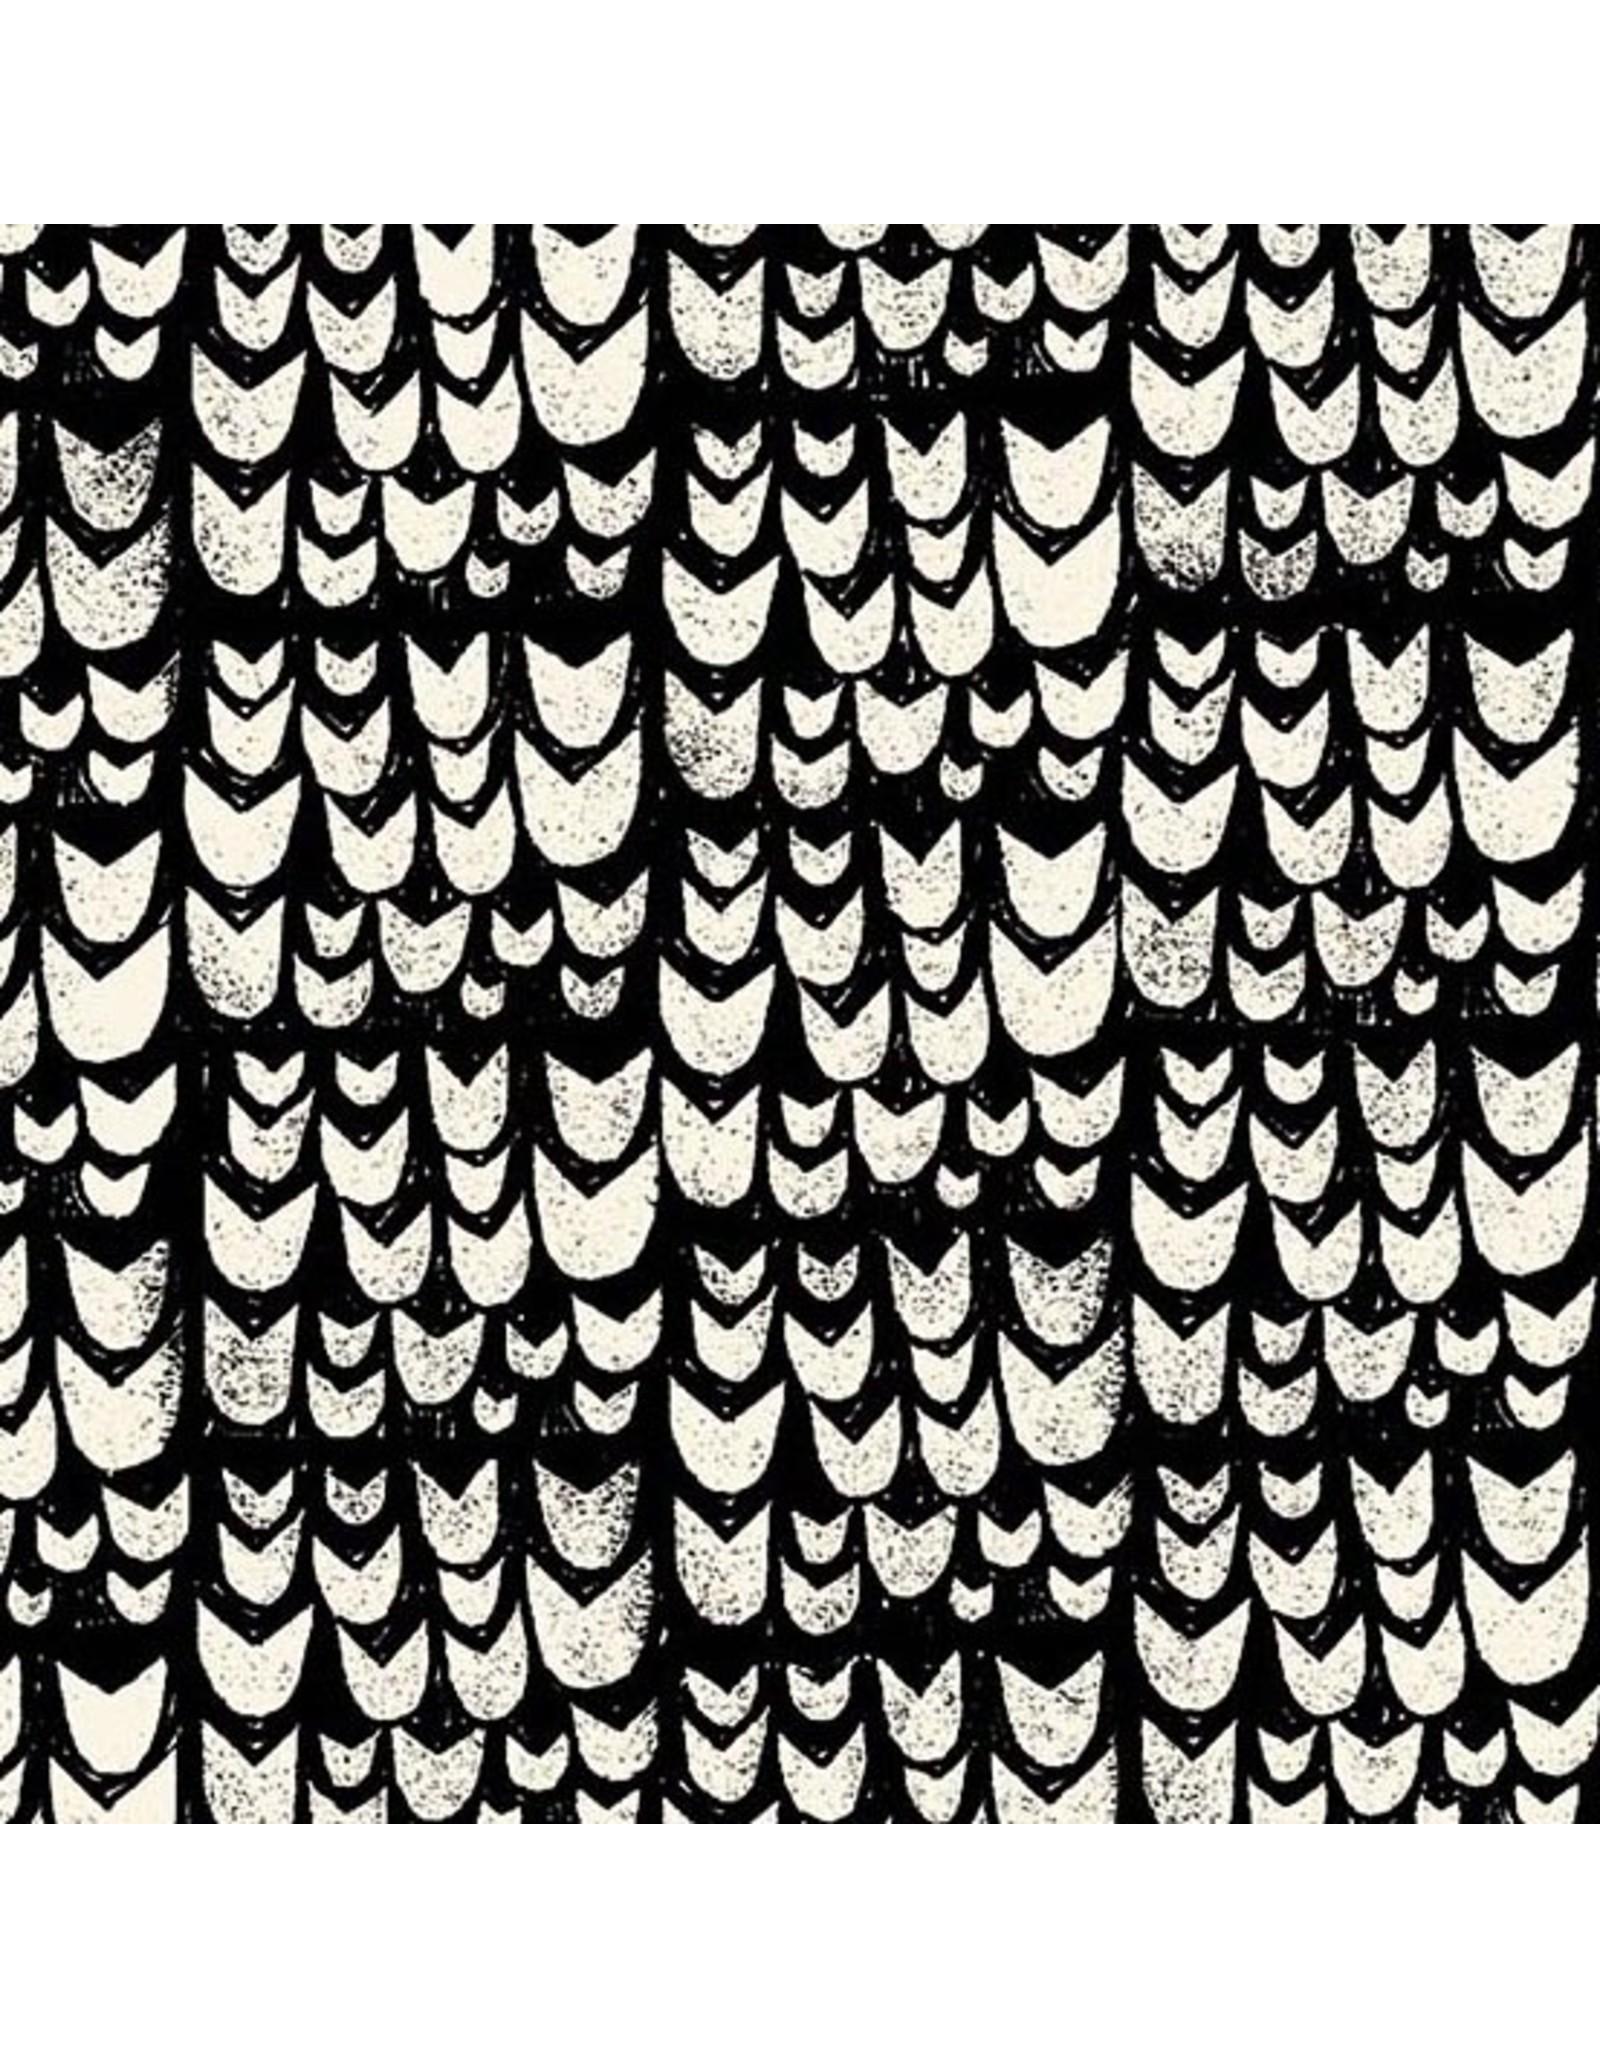 Andover Home - Tulips Noir